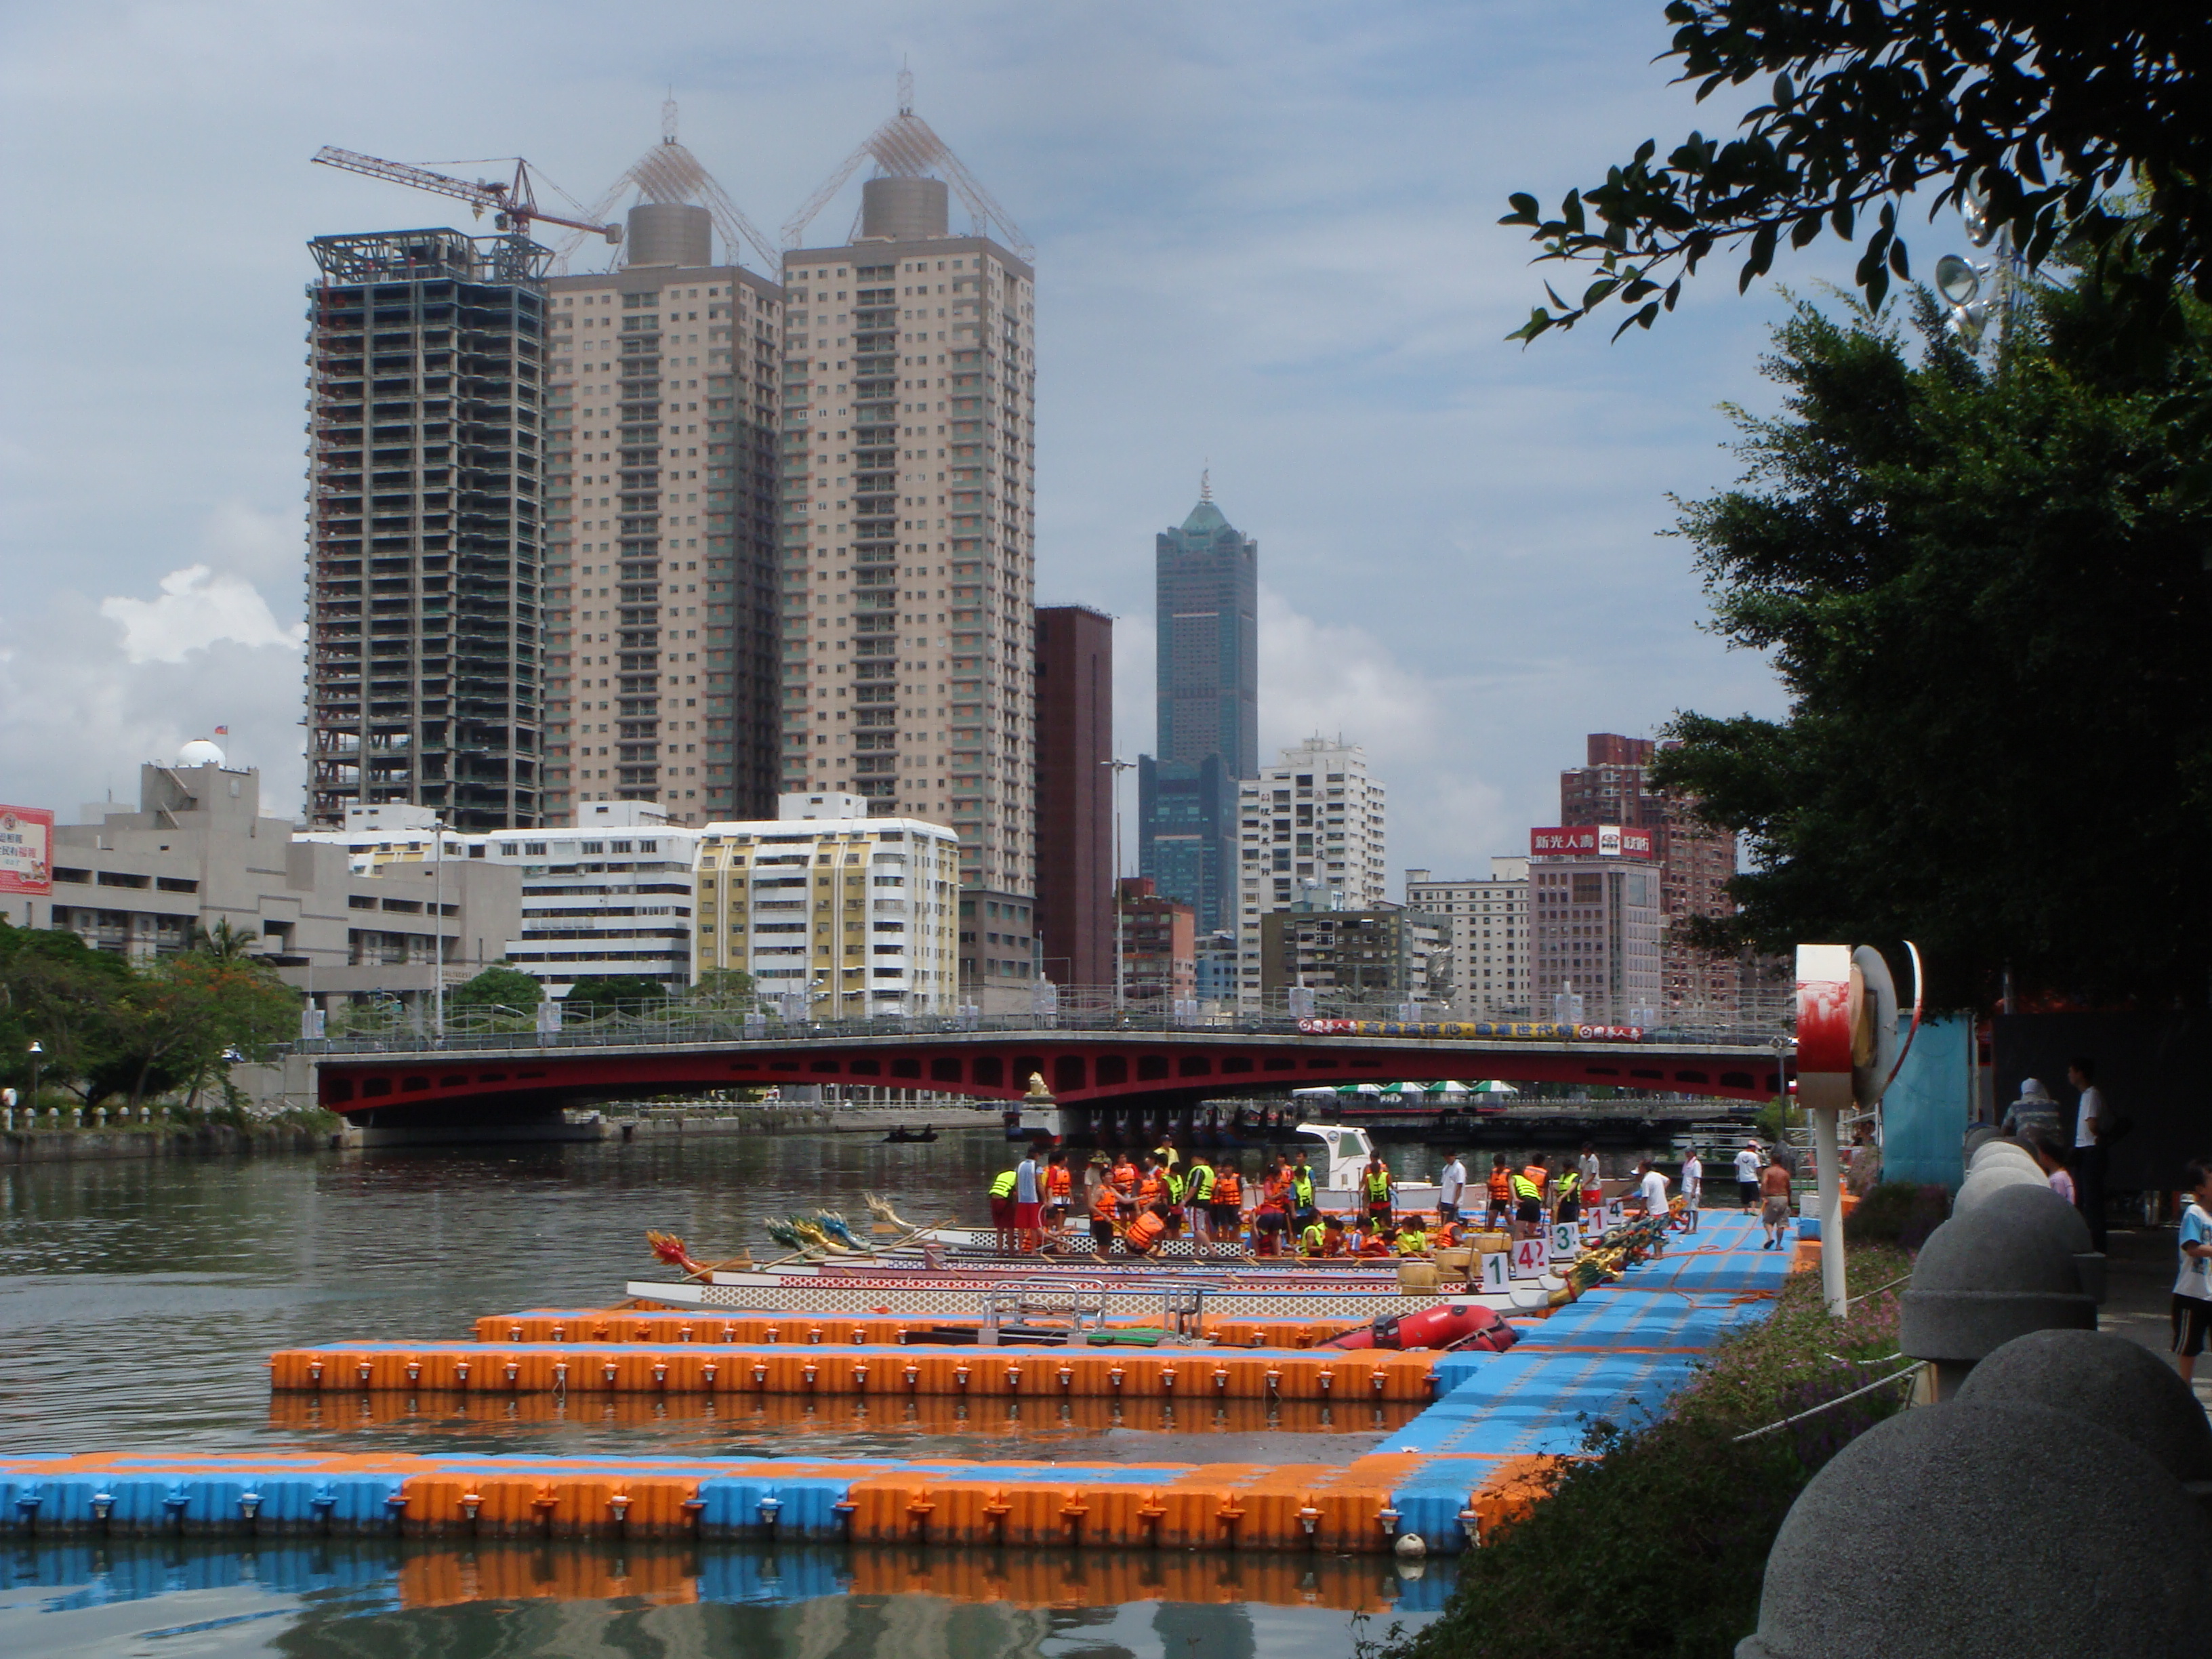 Muelles flotantes modulares municipios riberenos